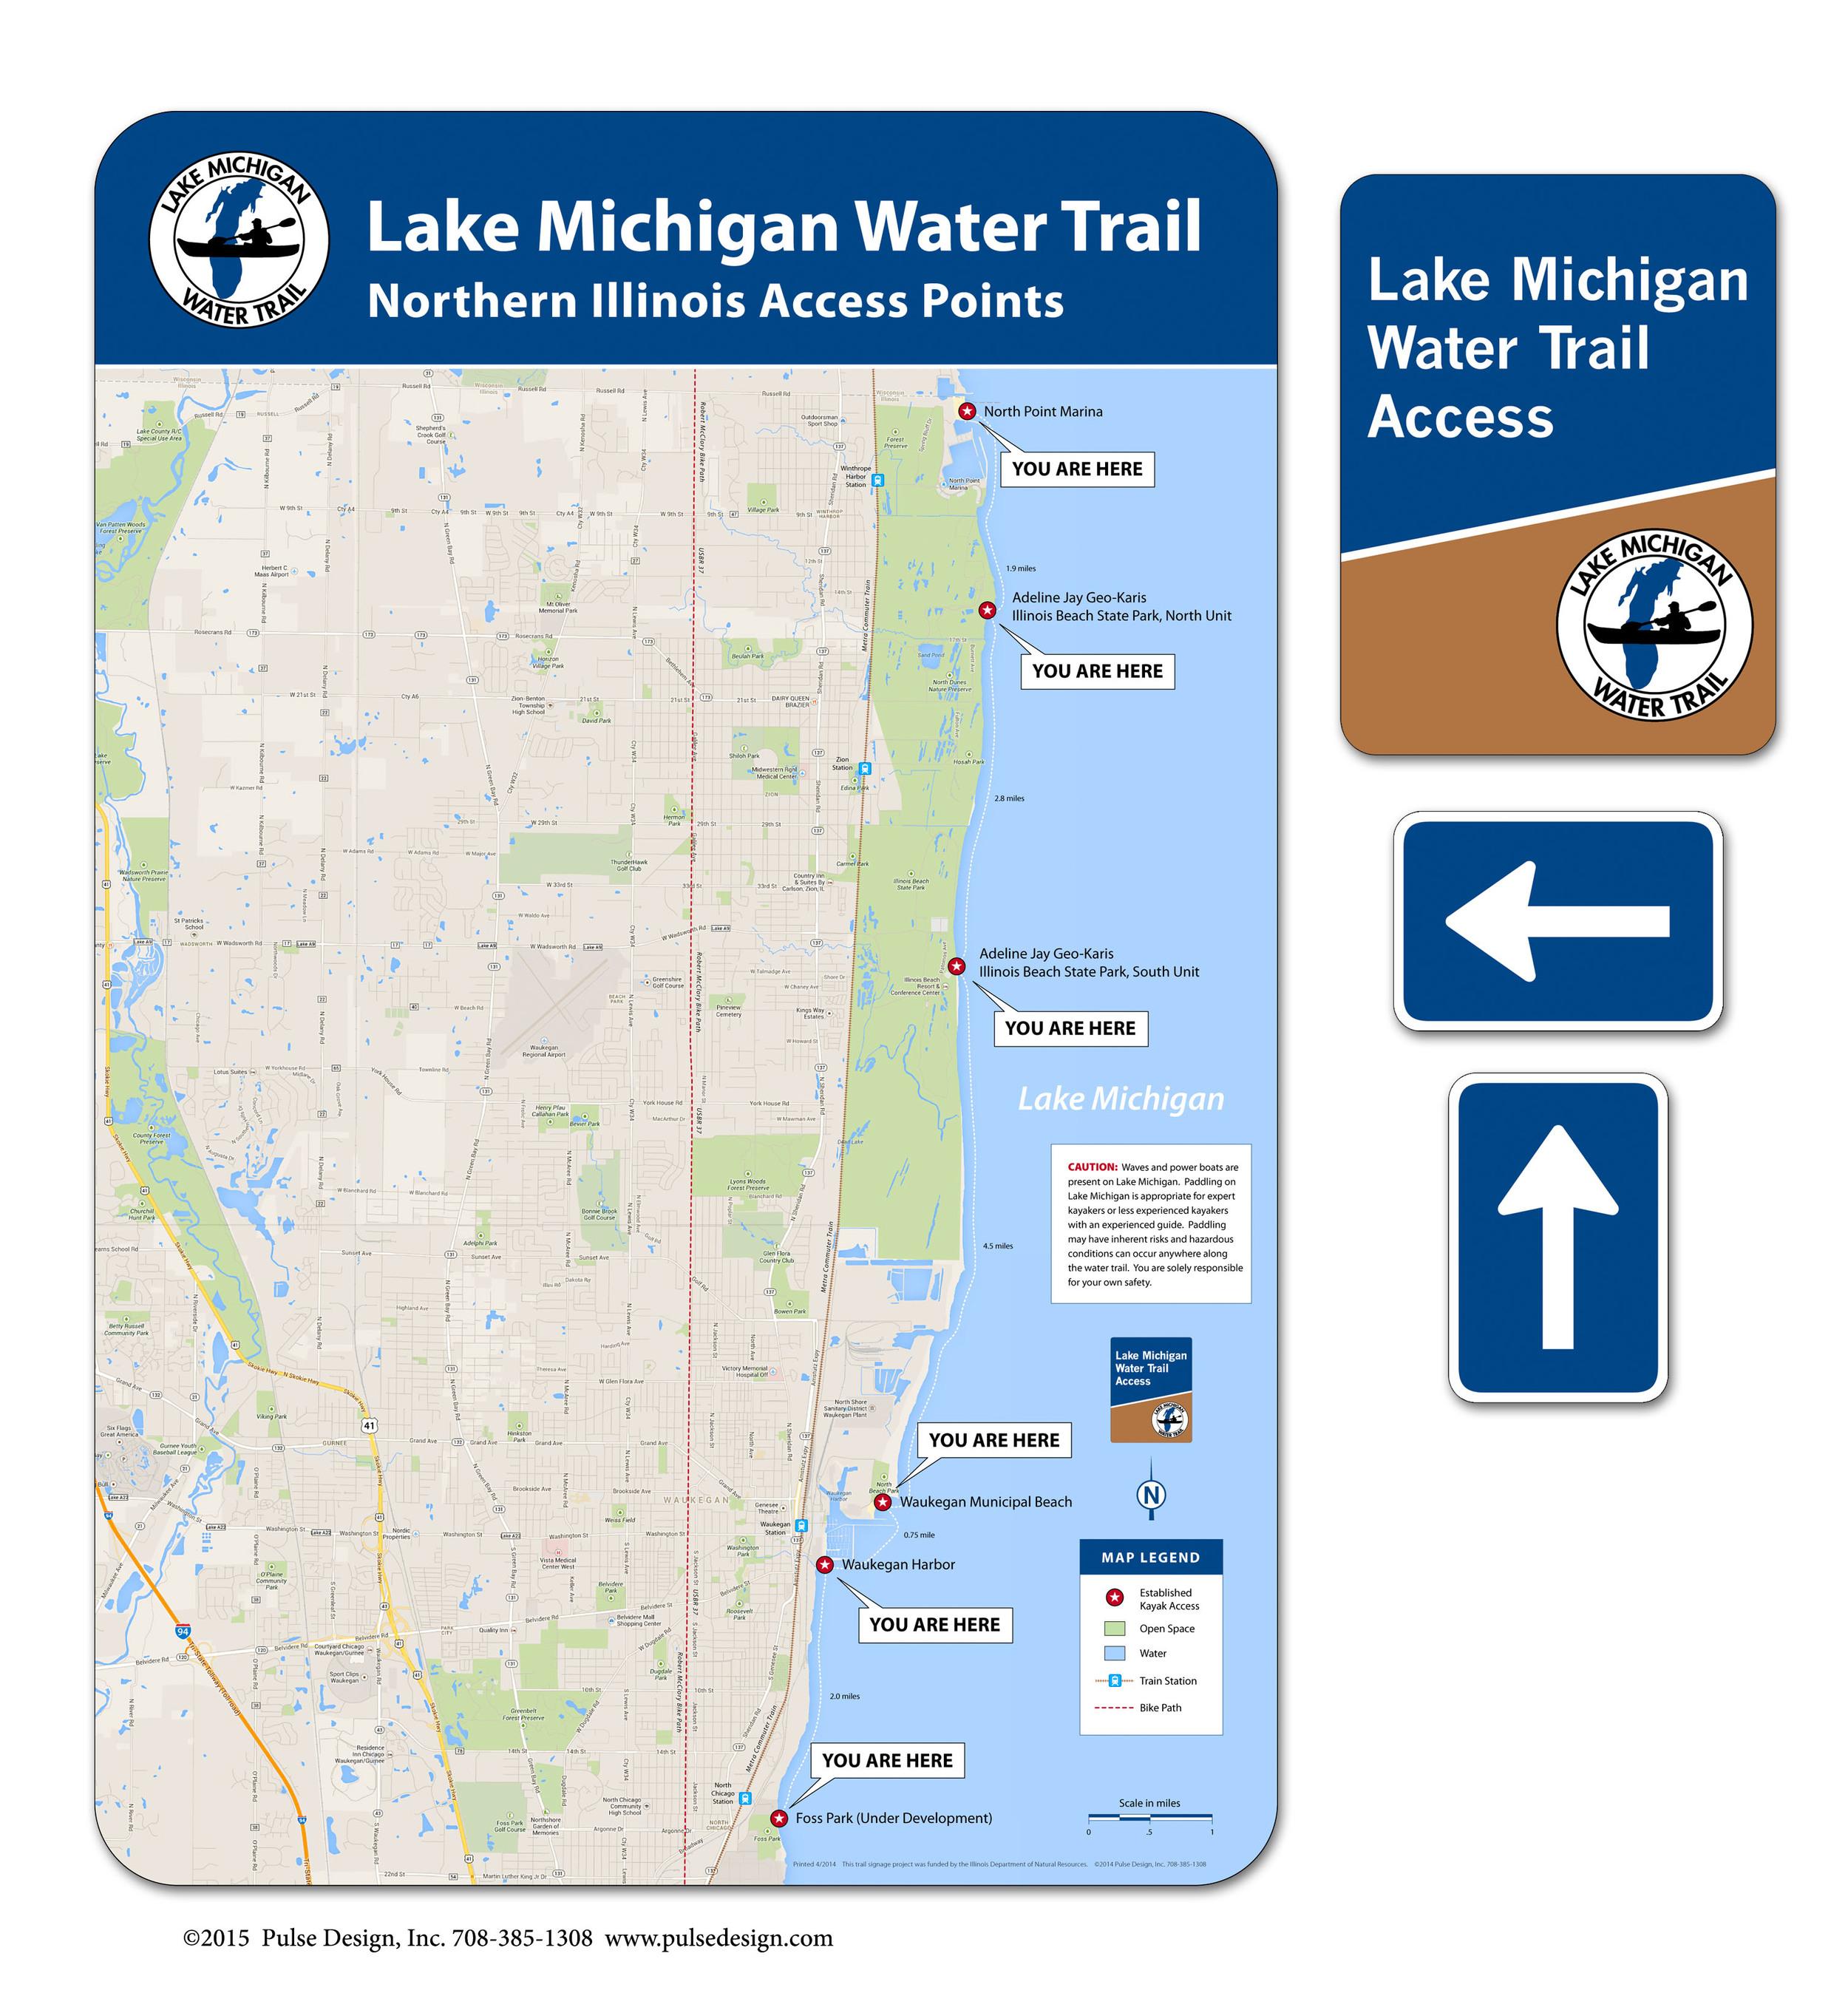 map-michigan-water-trail-pulse-design-inc.jpg